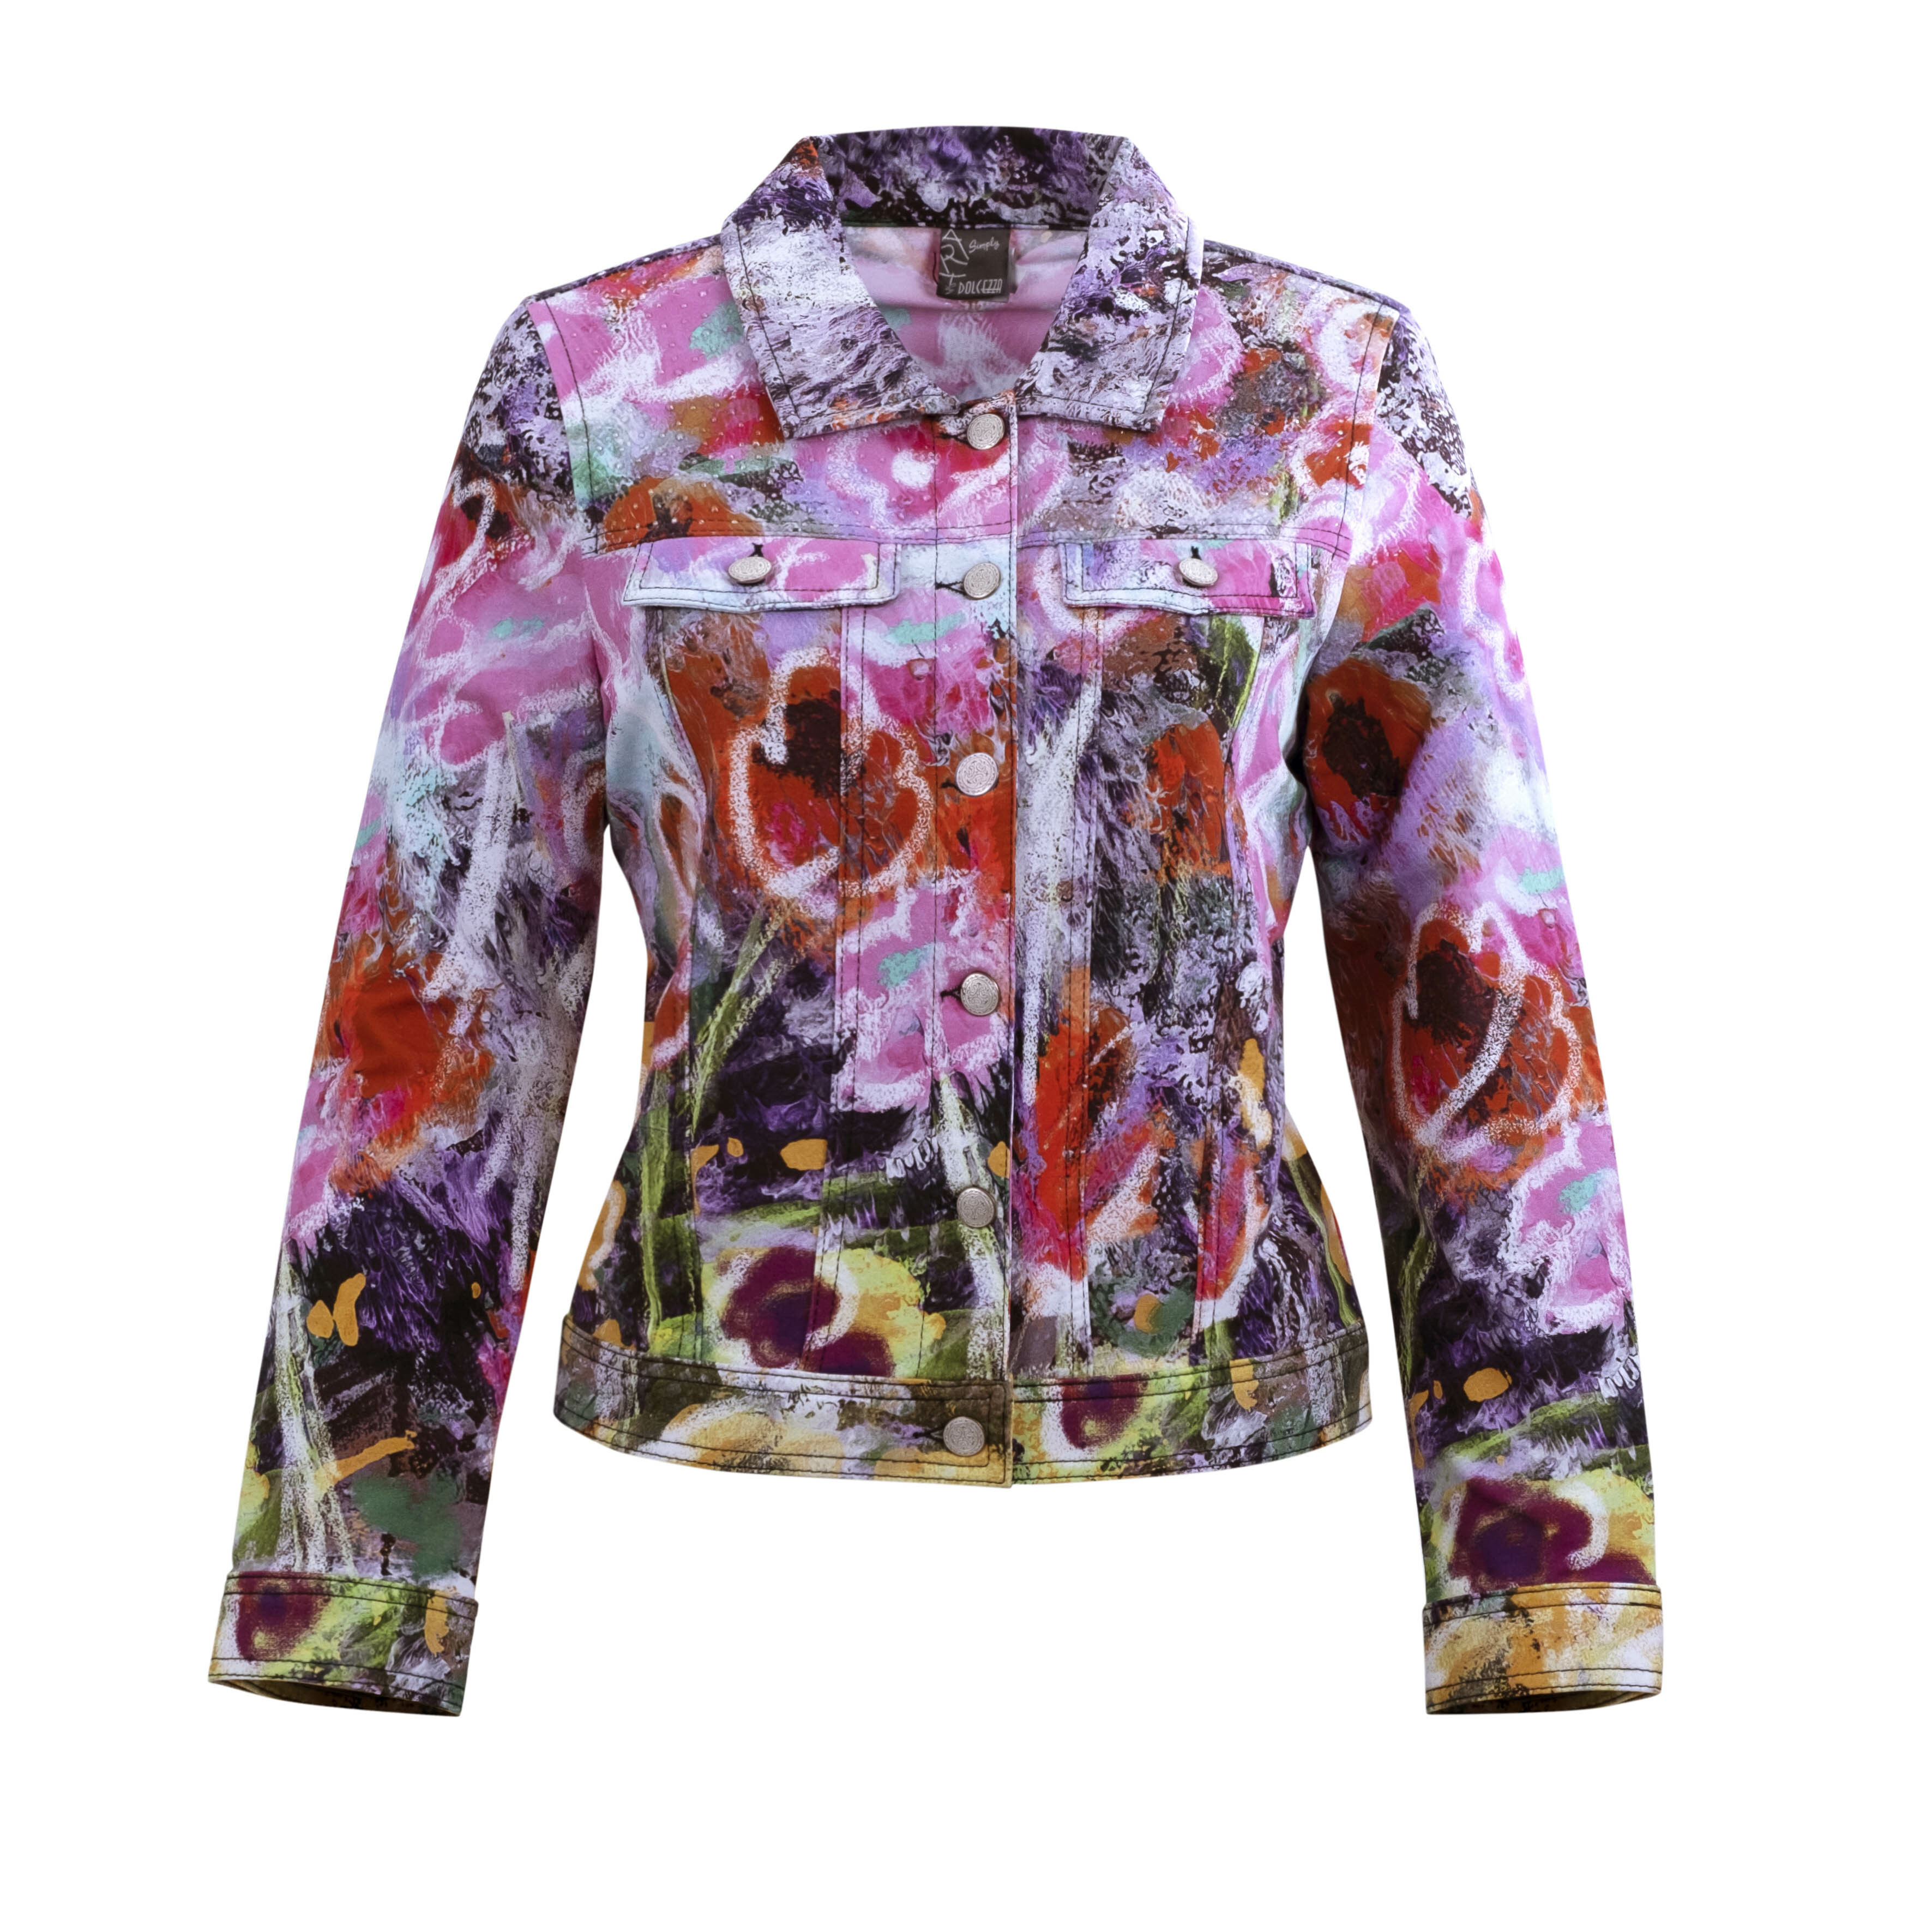 Simply Art Dolcezza: Wildest Flowers Abstract Art Denim Jacket DOLCEZZA_SIMPLYART_20610